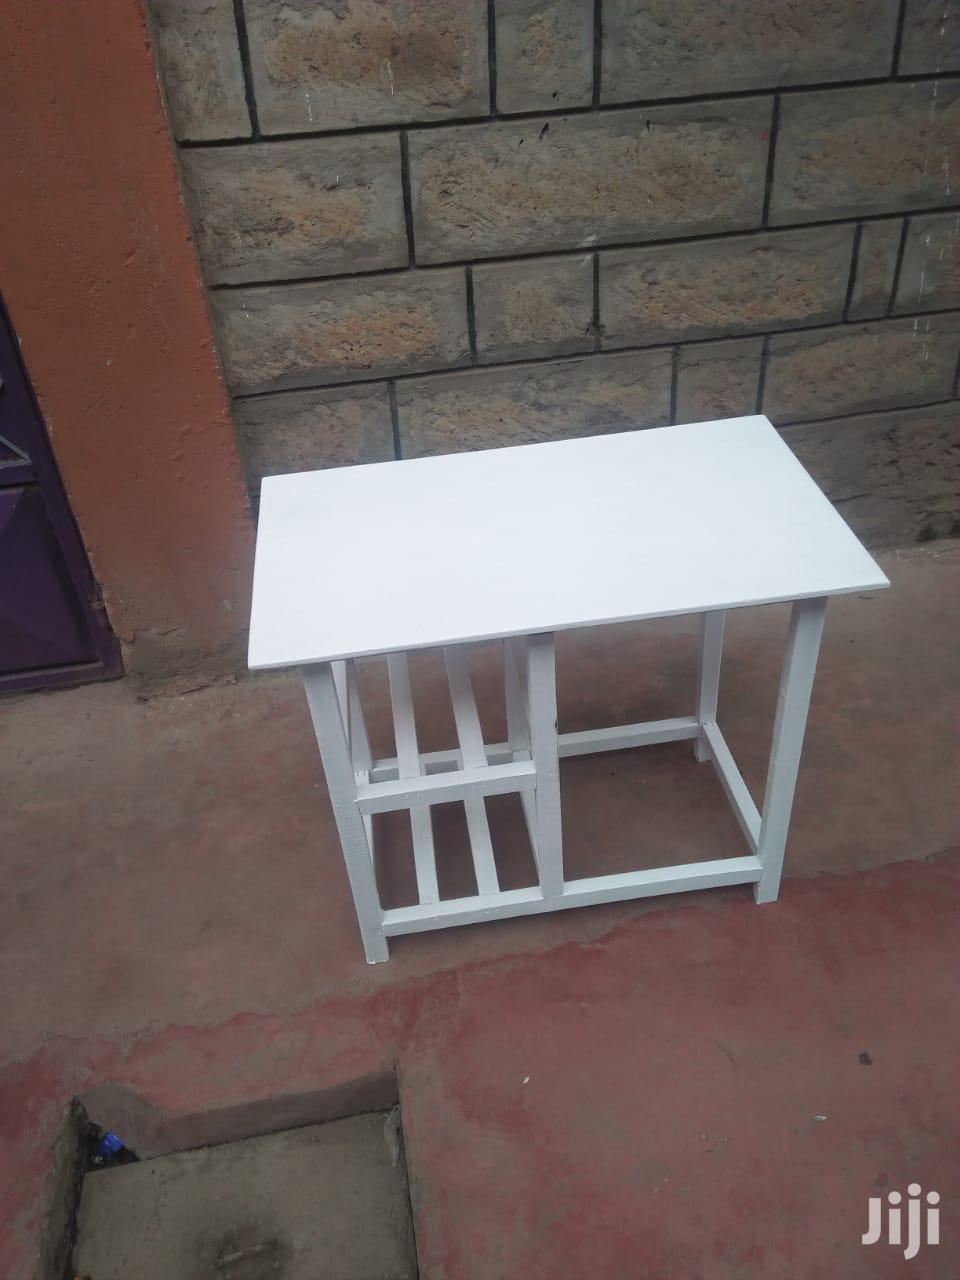 Kitchen Tables | Furniture for sale in Nairobi Central, Nairobi, Kenya